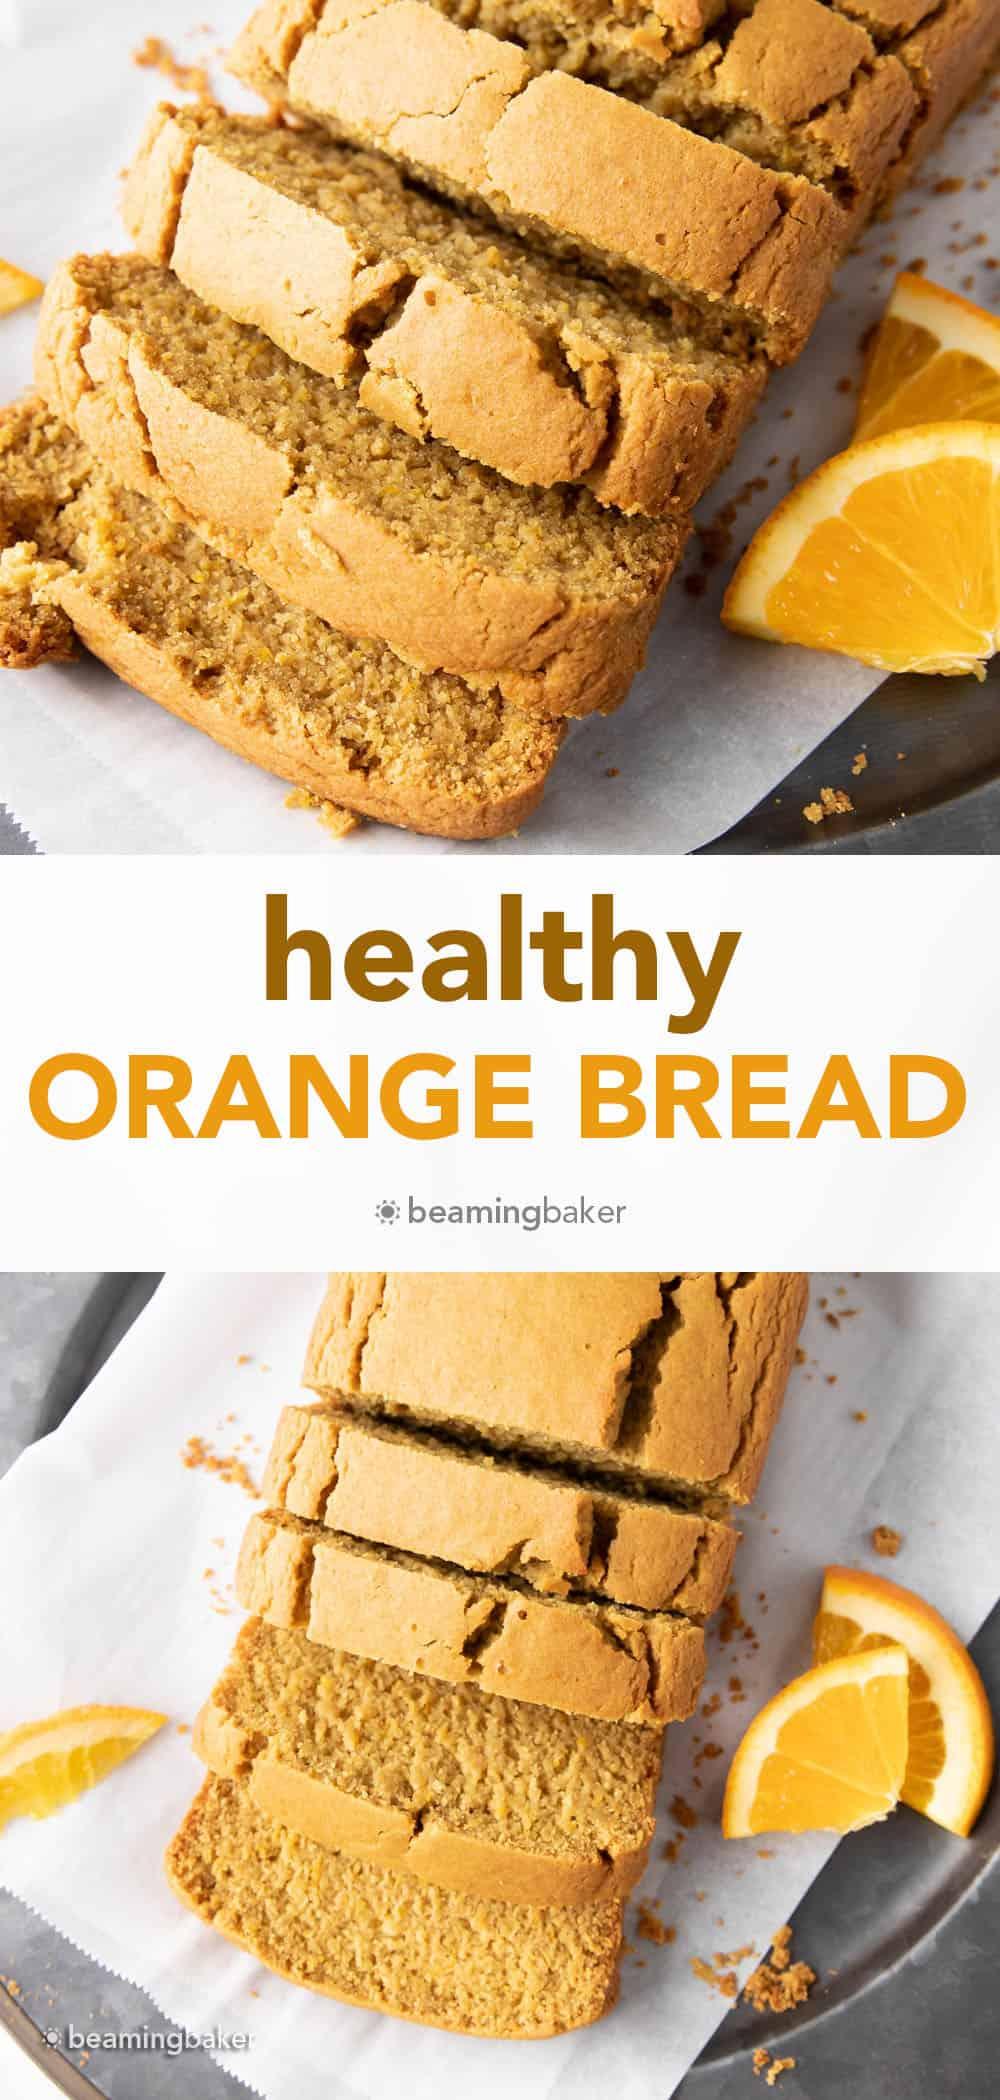 Deliciously Healthy Orange Bread: soft 'n moist healthy orange bread made with healthy, whole ingredients. Bursting with bright orange flavor. #Healthy #Orange #Bread | Recipe at BeamingBaker.com